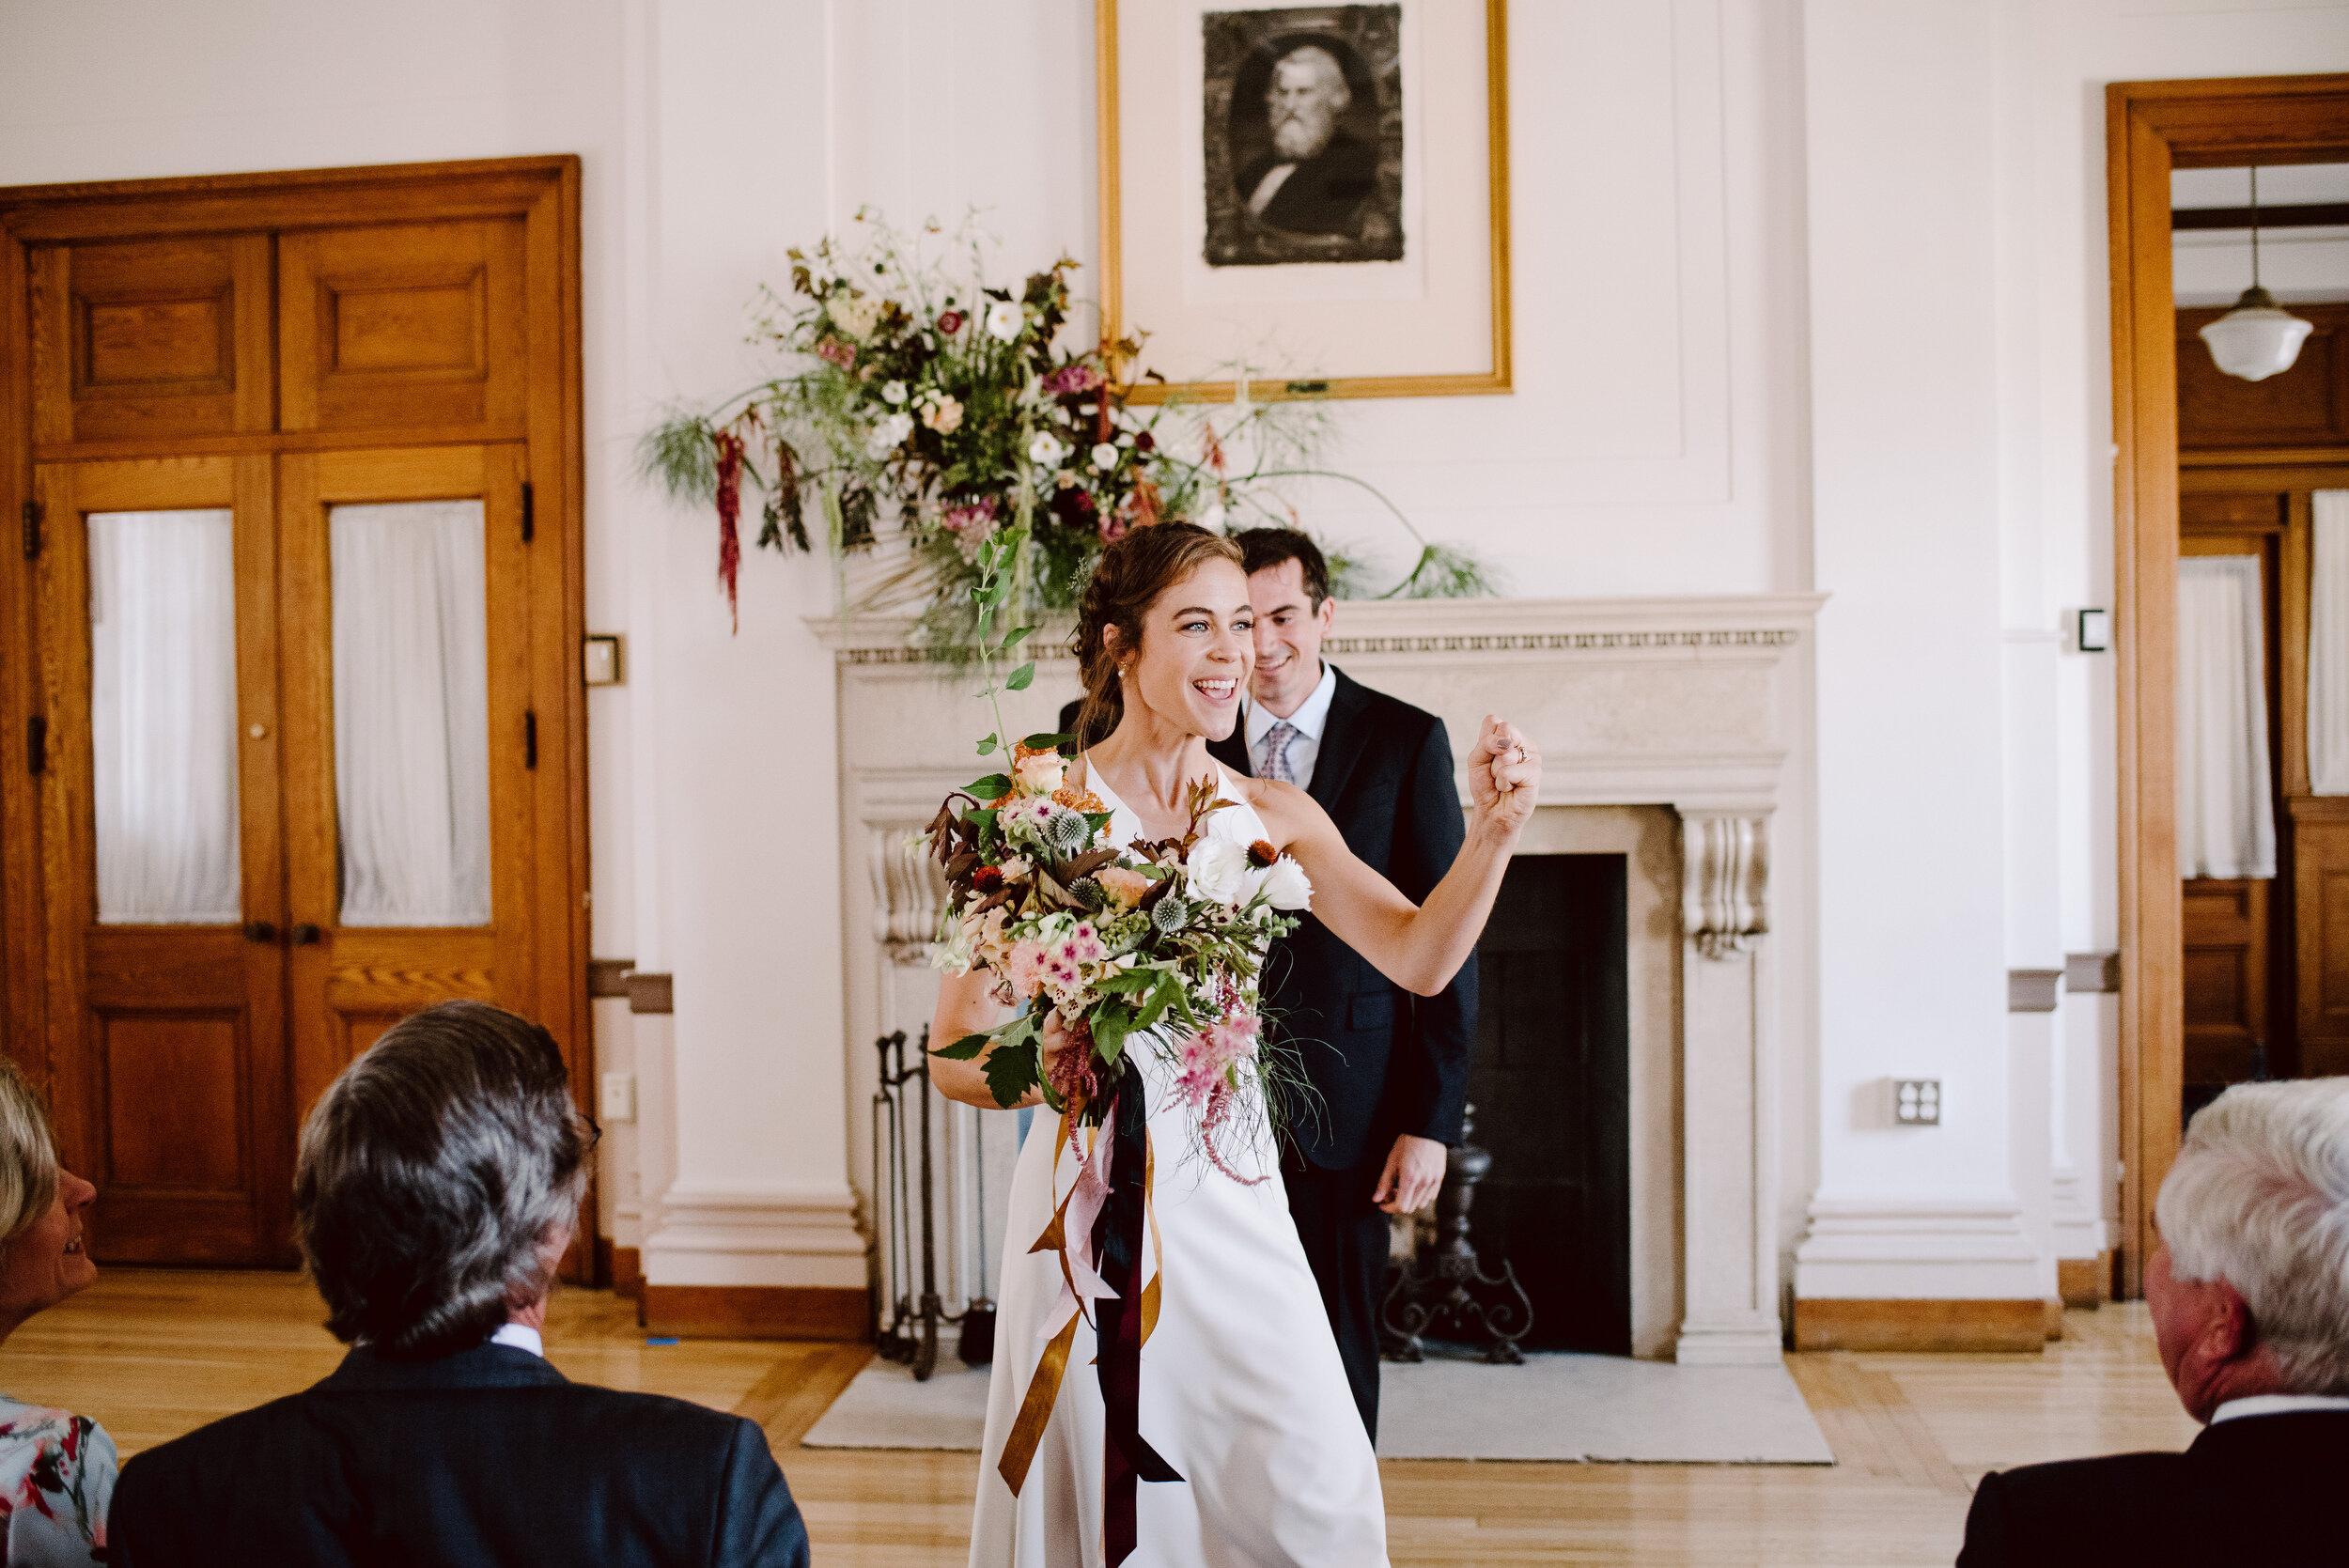 portland_city_hall_wedding_mikhail_glabet_25.JPG